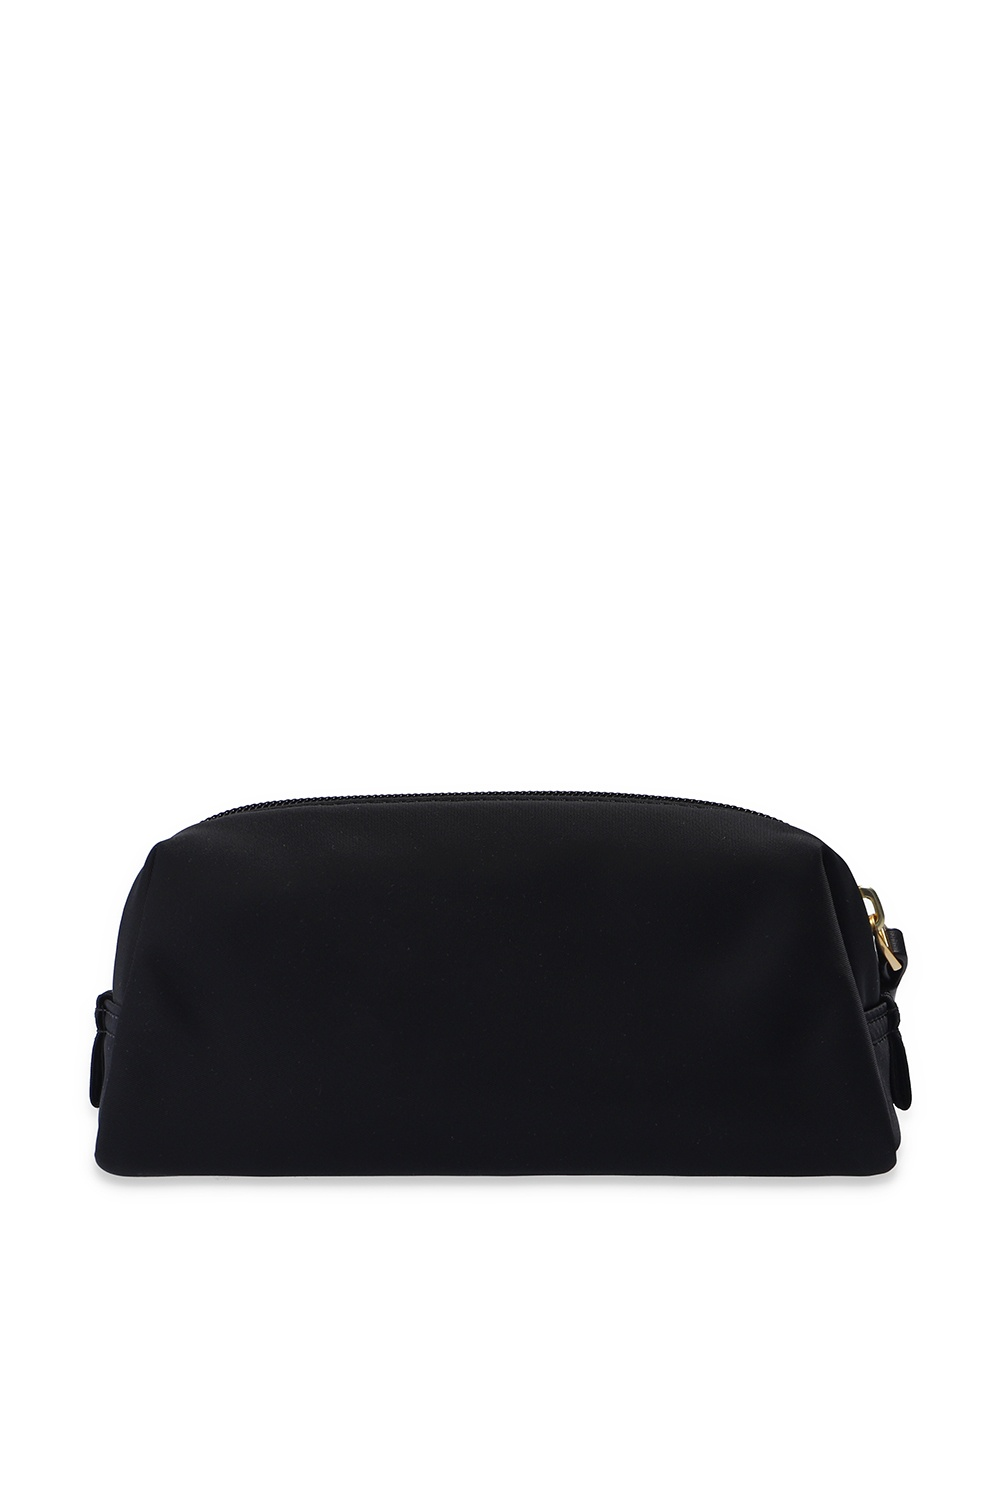 Tory Burch Branded wash bag